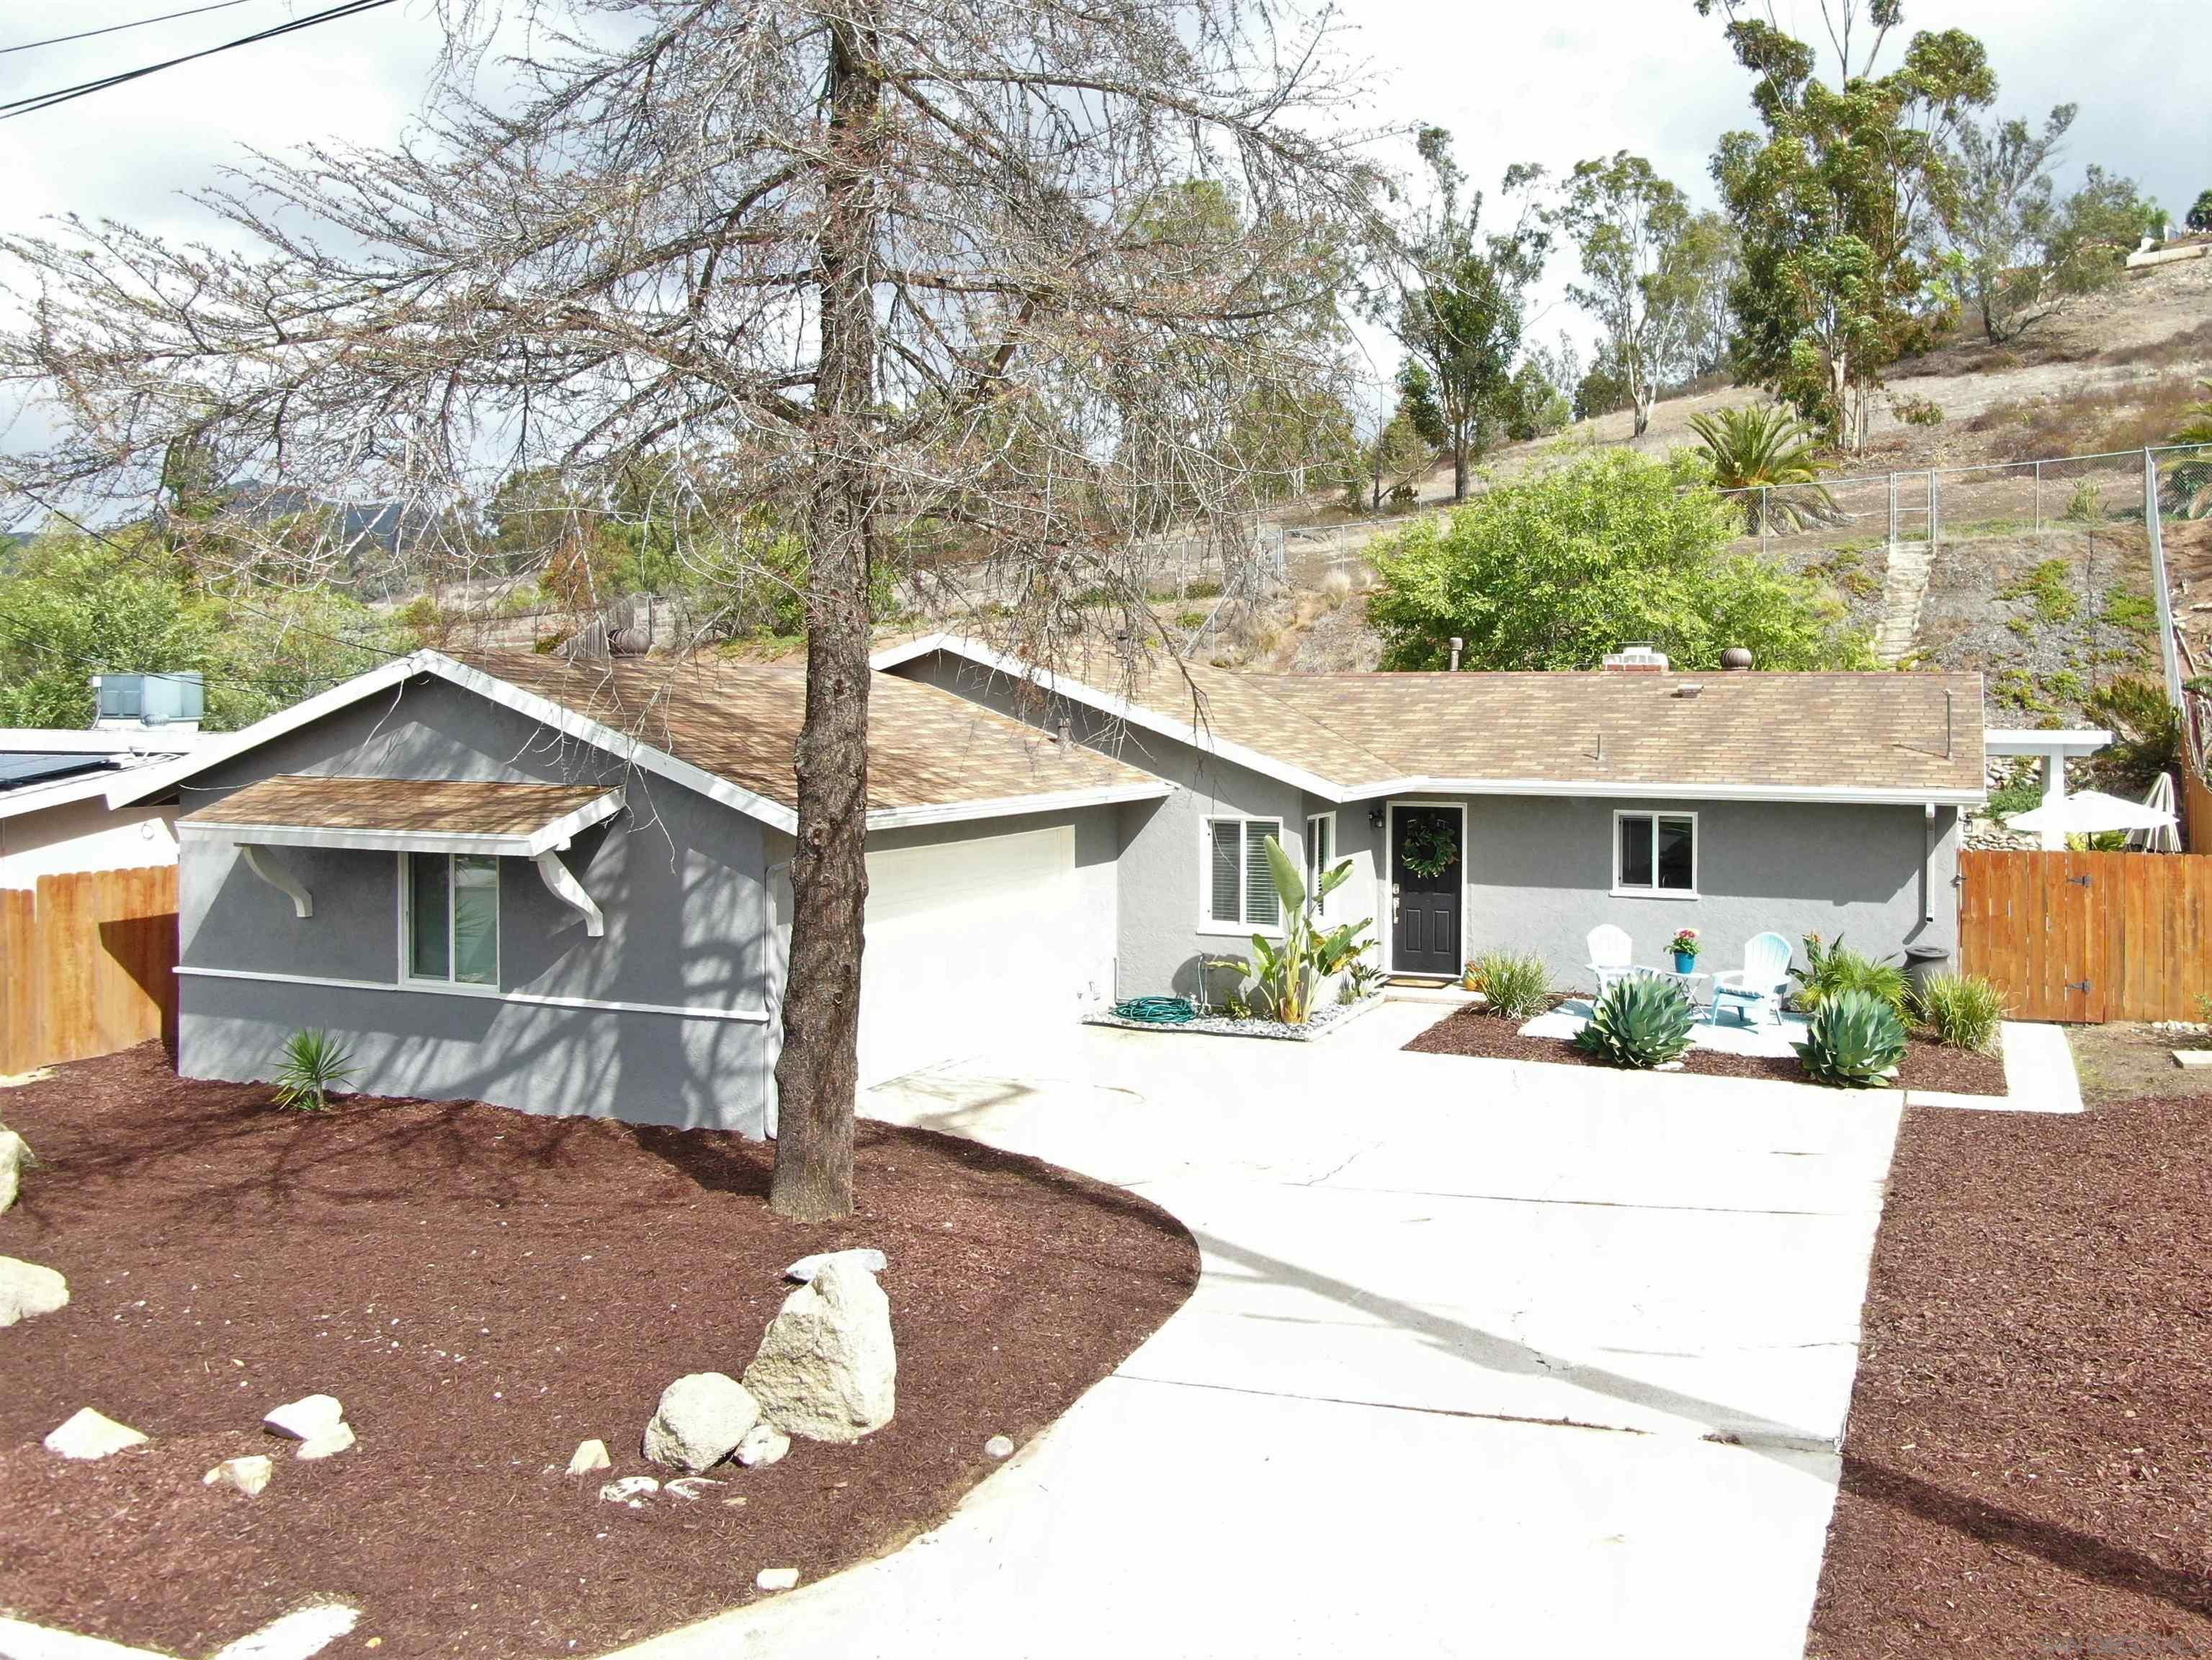 14127 Tobiasson Rd, Poway, CA 92064